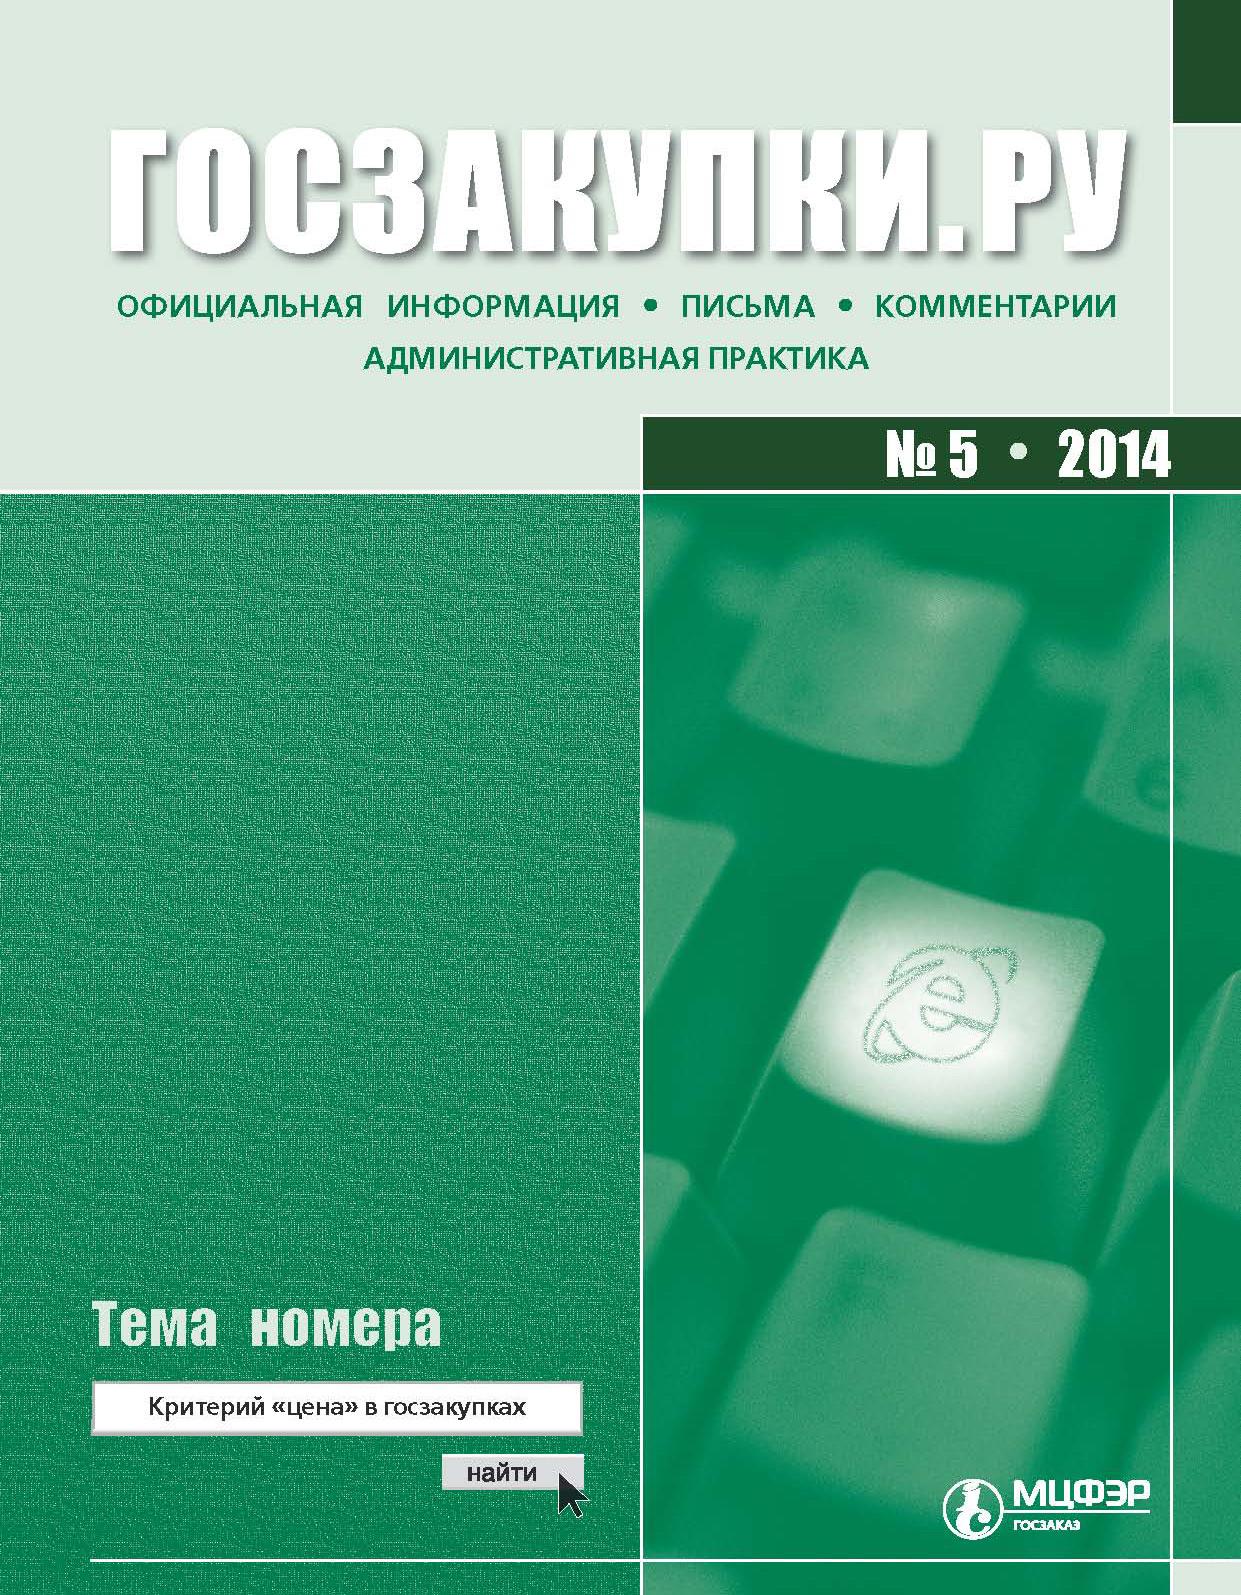 Госзакупки.ру № 5 2014